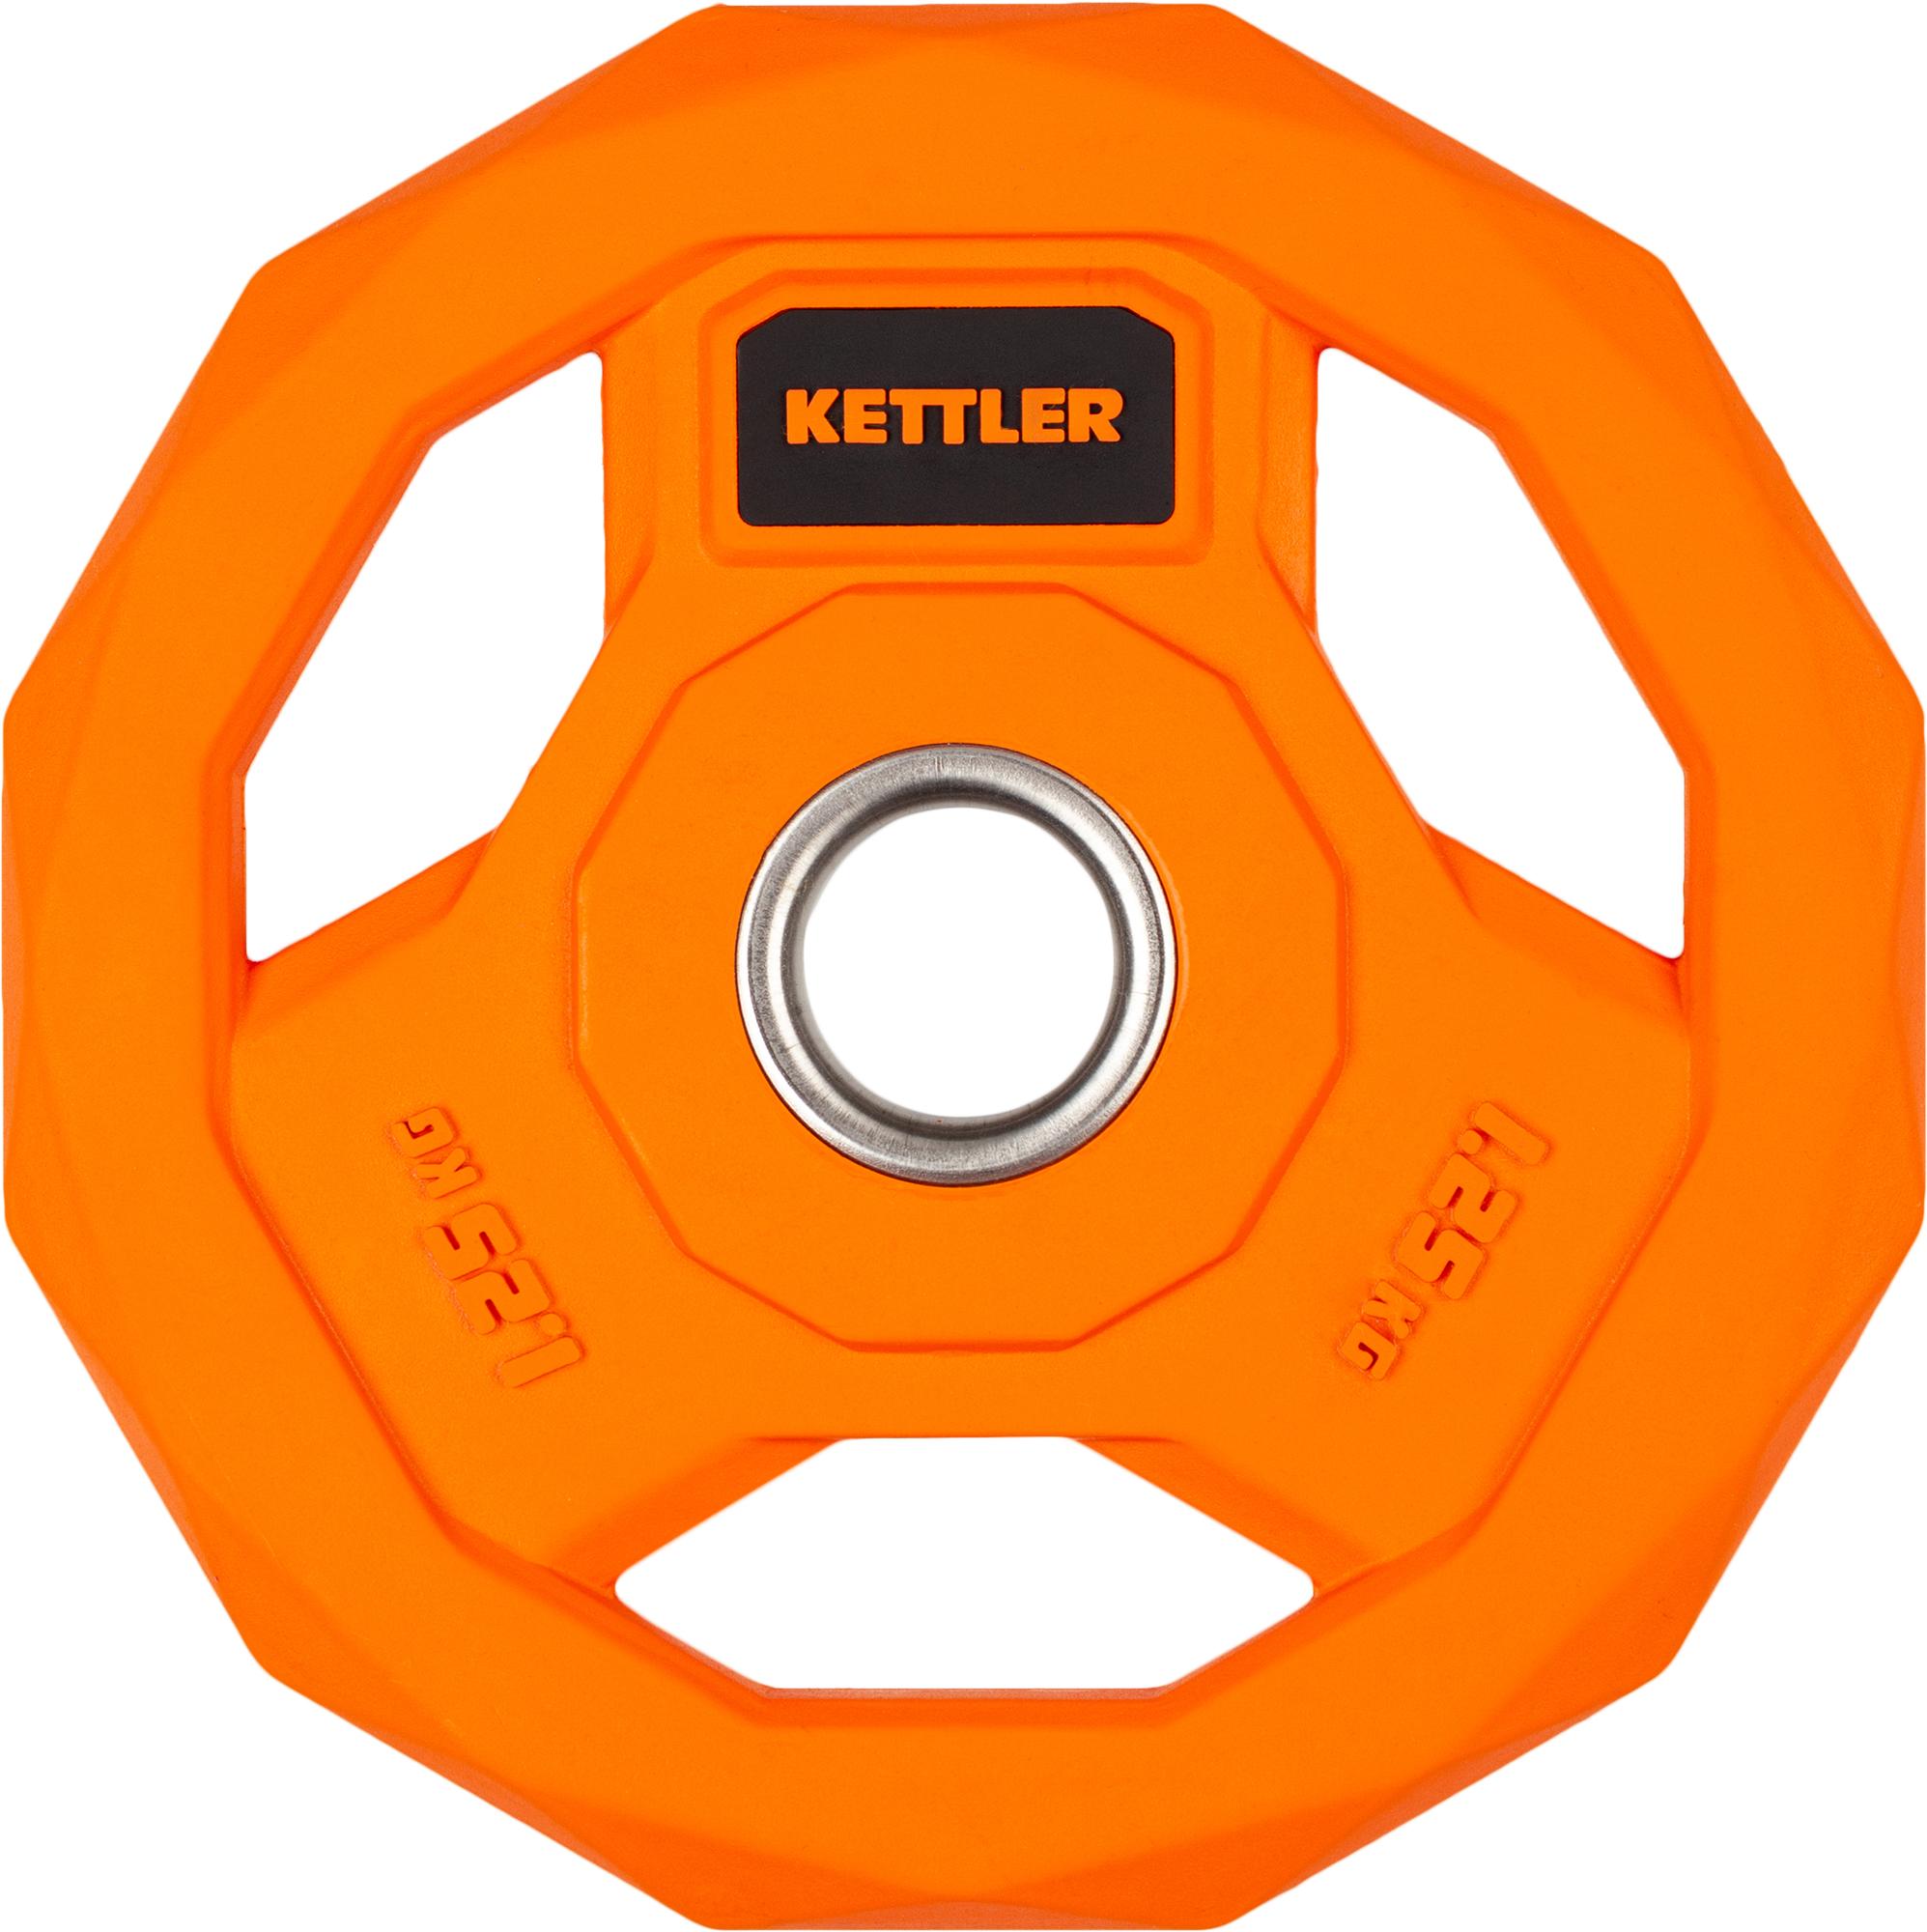 Kettler Блин стальной обрезиненный Kettler 1,25 кг